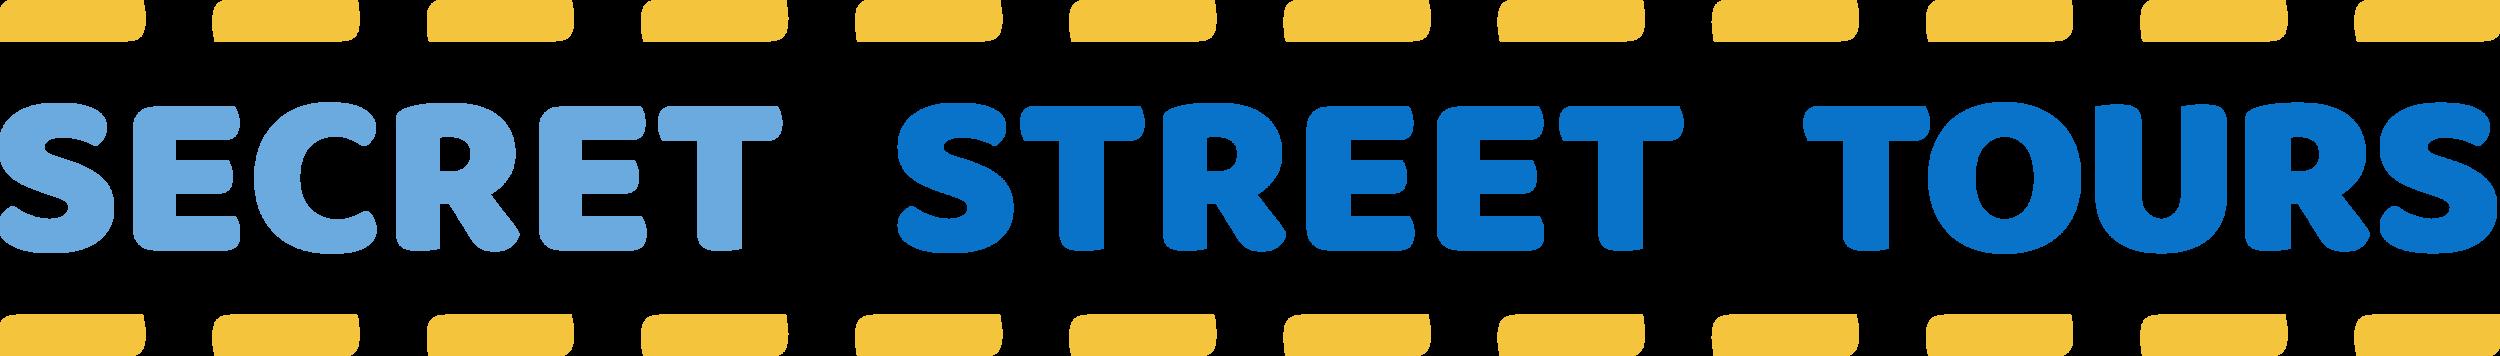 Secret_Street_Tours_Logo_Horz_onWhite_RGB (1).png